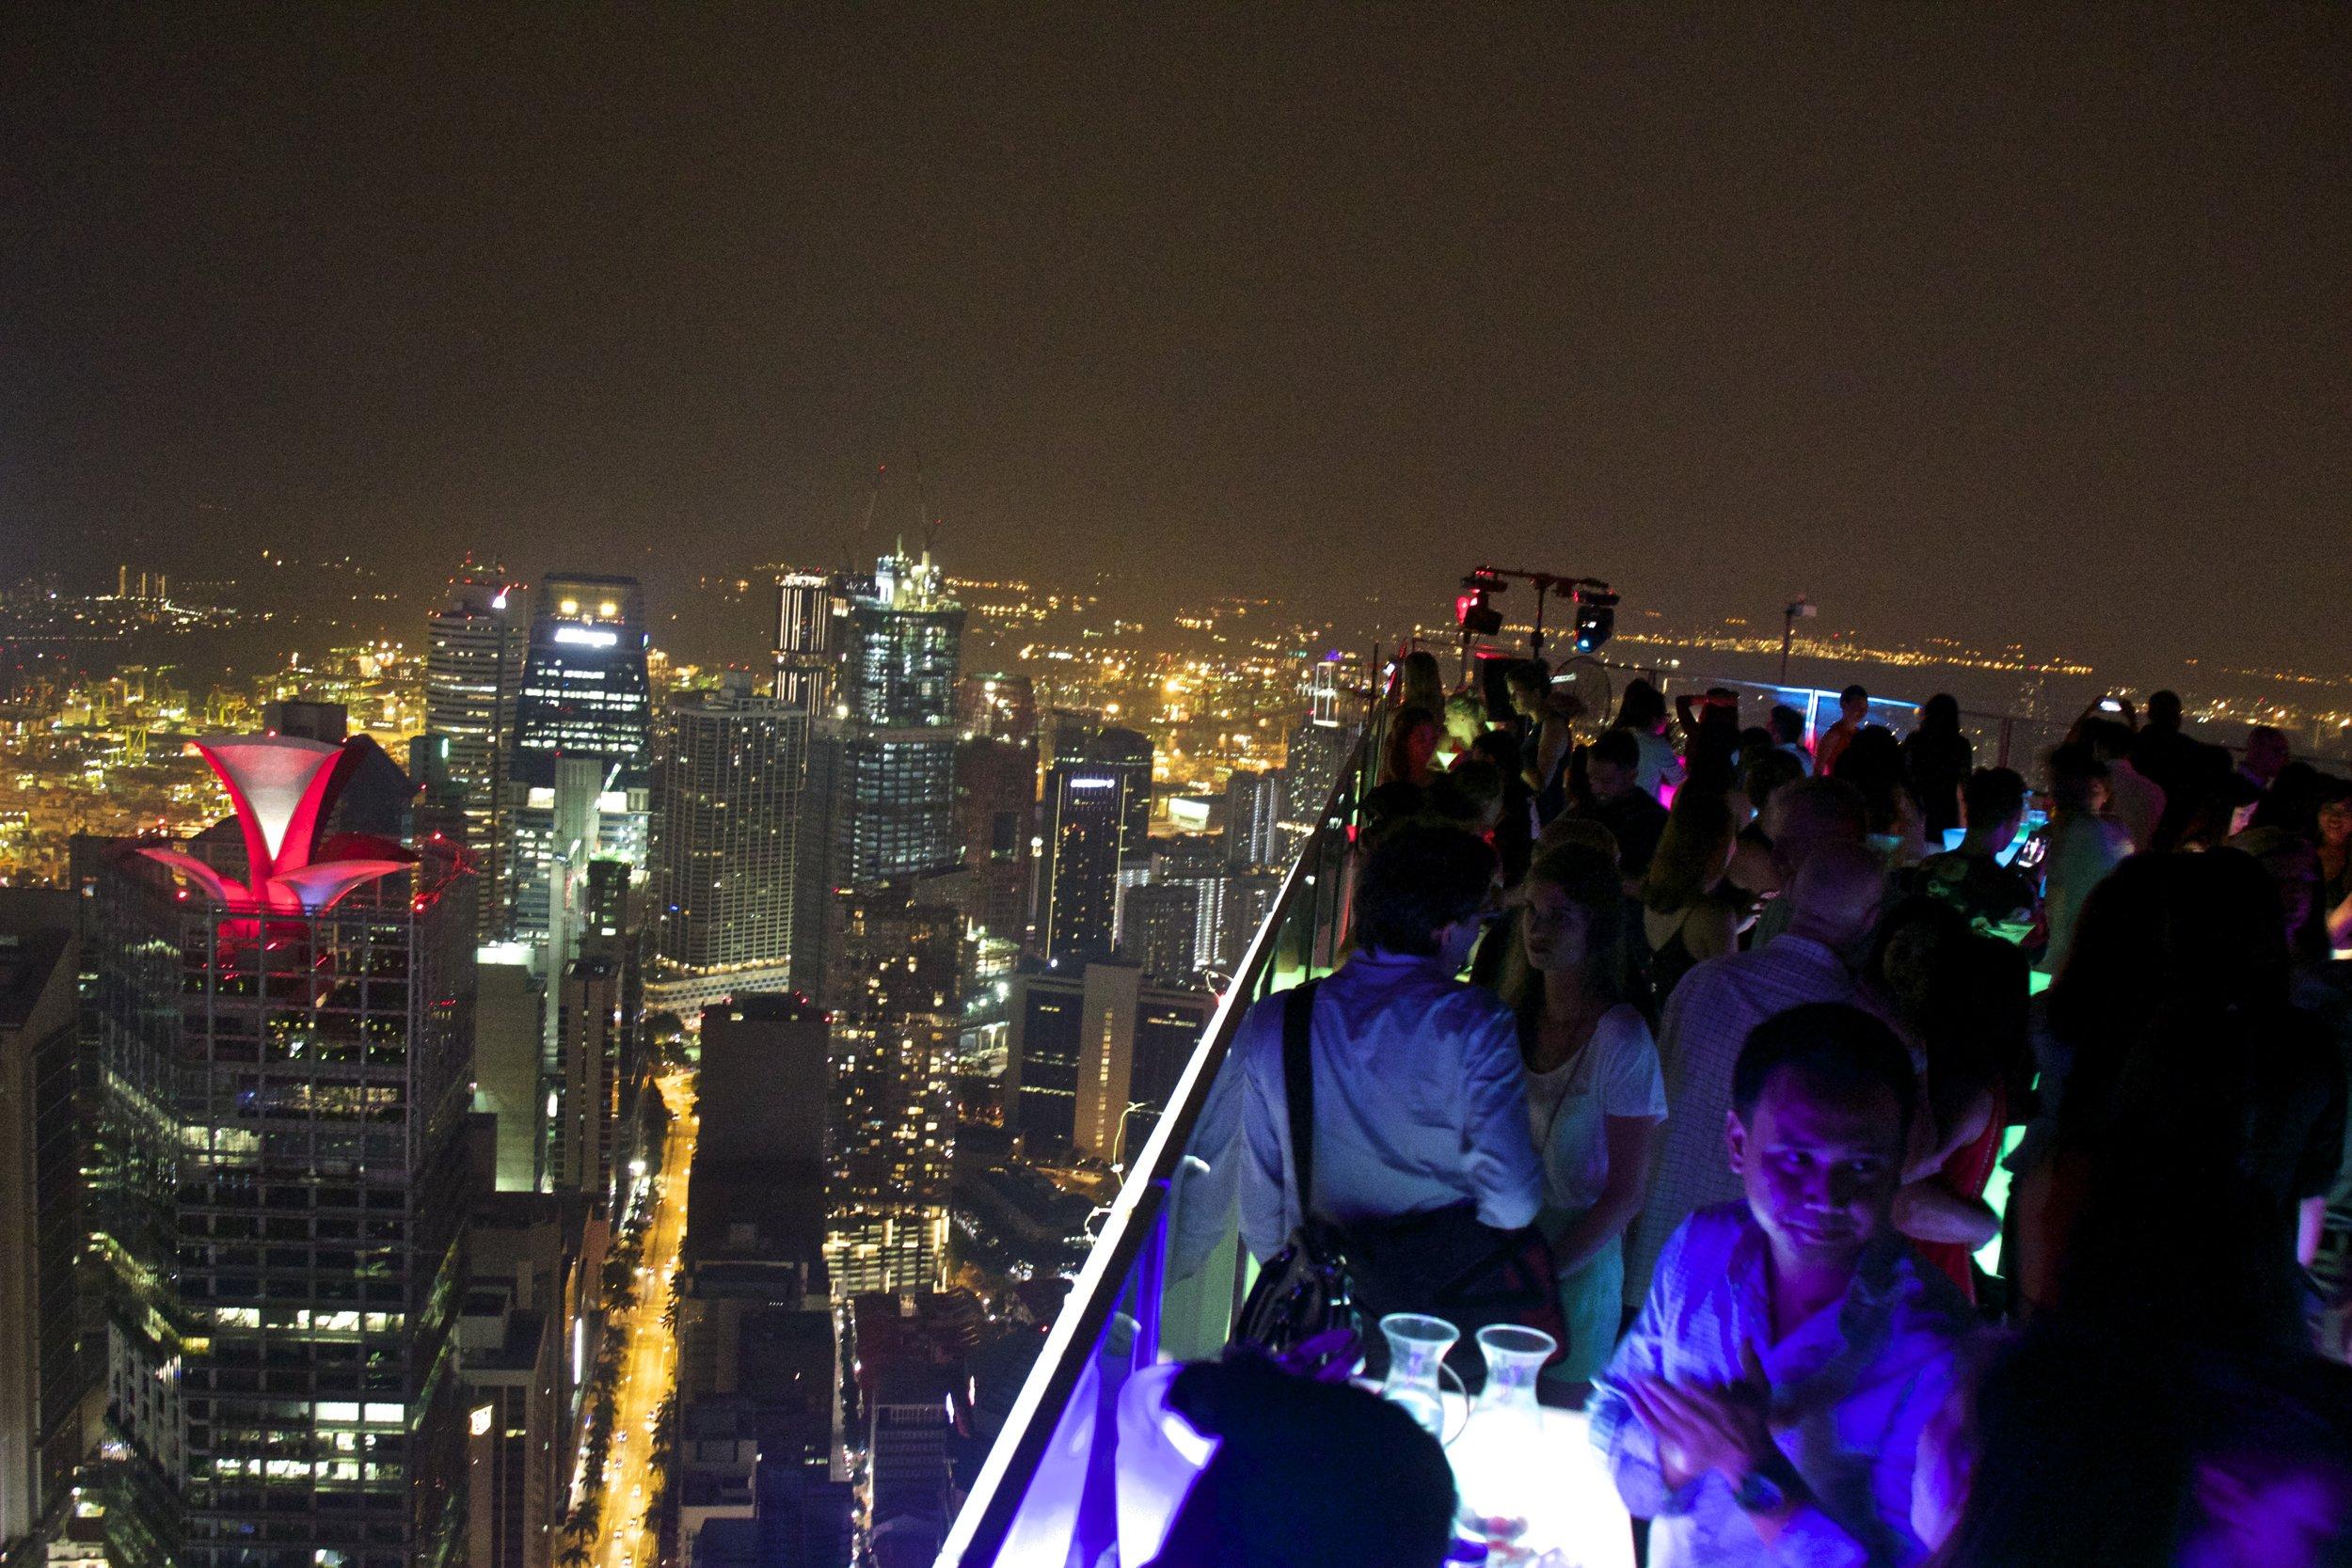 1 Altitude Rooftop Open Air Bar Singapore Nightlife 1.jpg